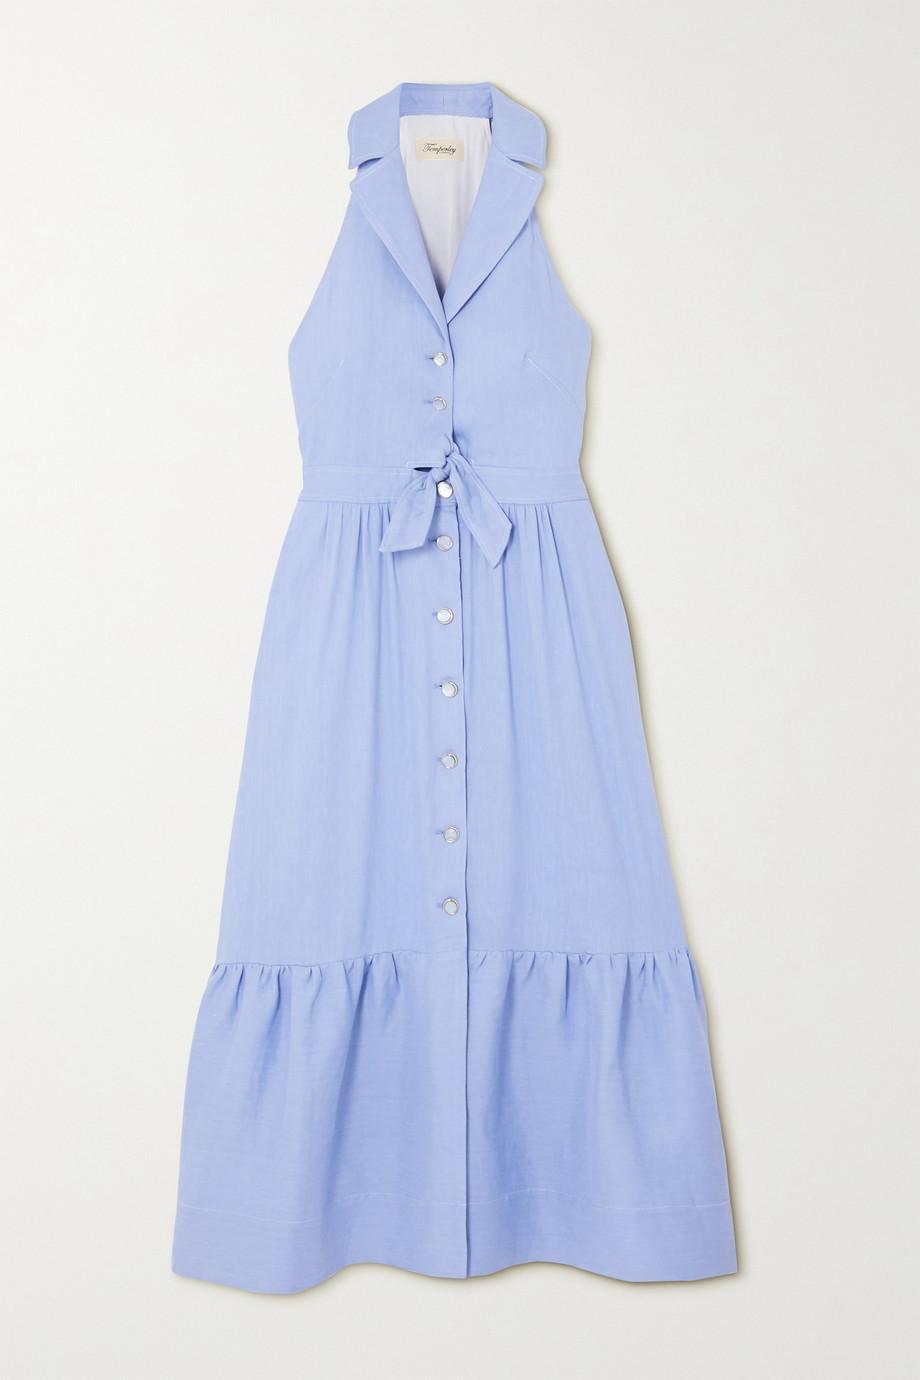 Temperley London | Sophia tie-detailed cutout tiered linen-blend dress  | NET-A-PORTER.COM